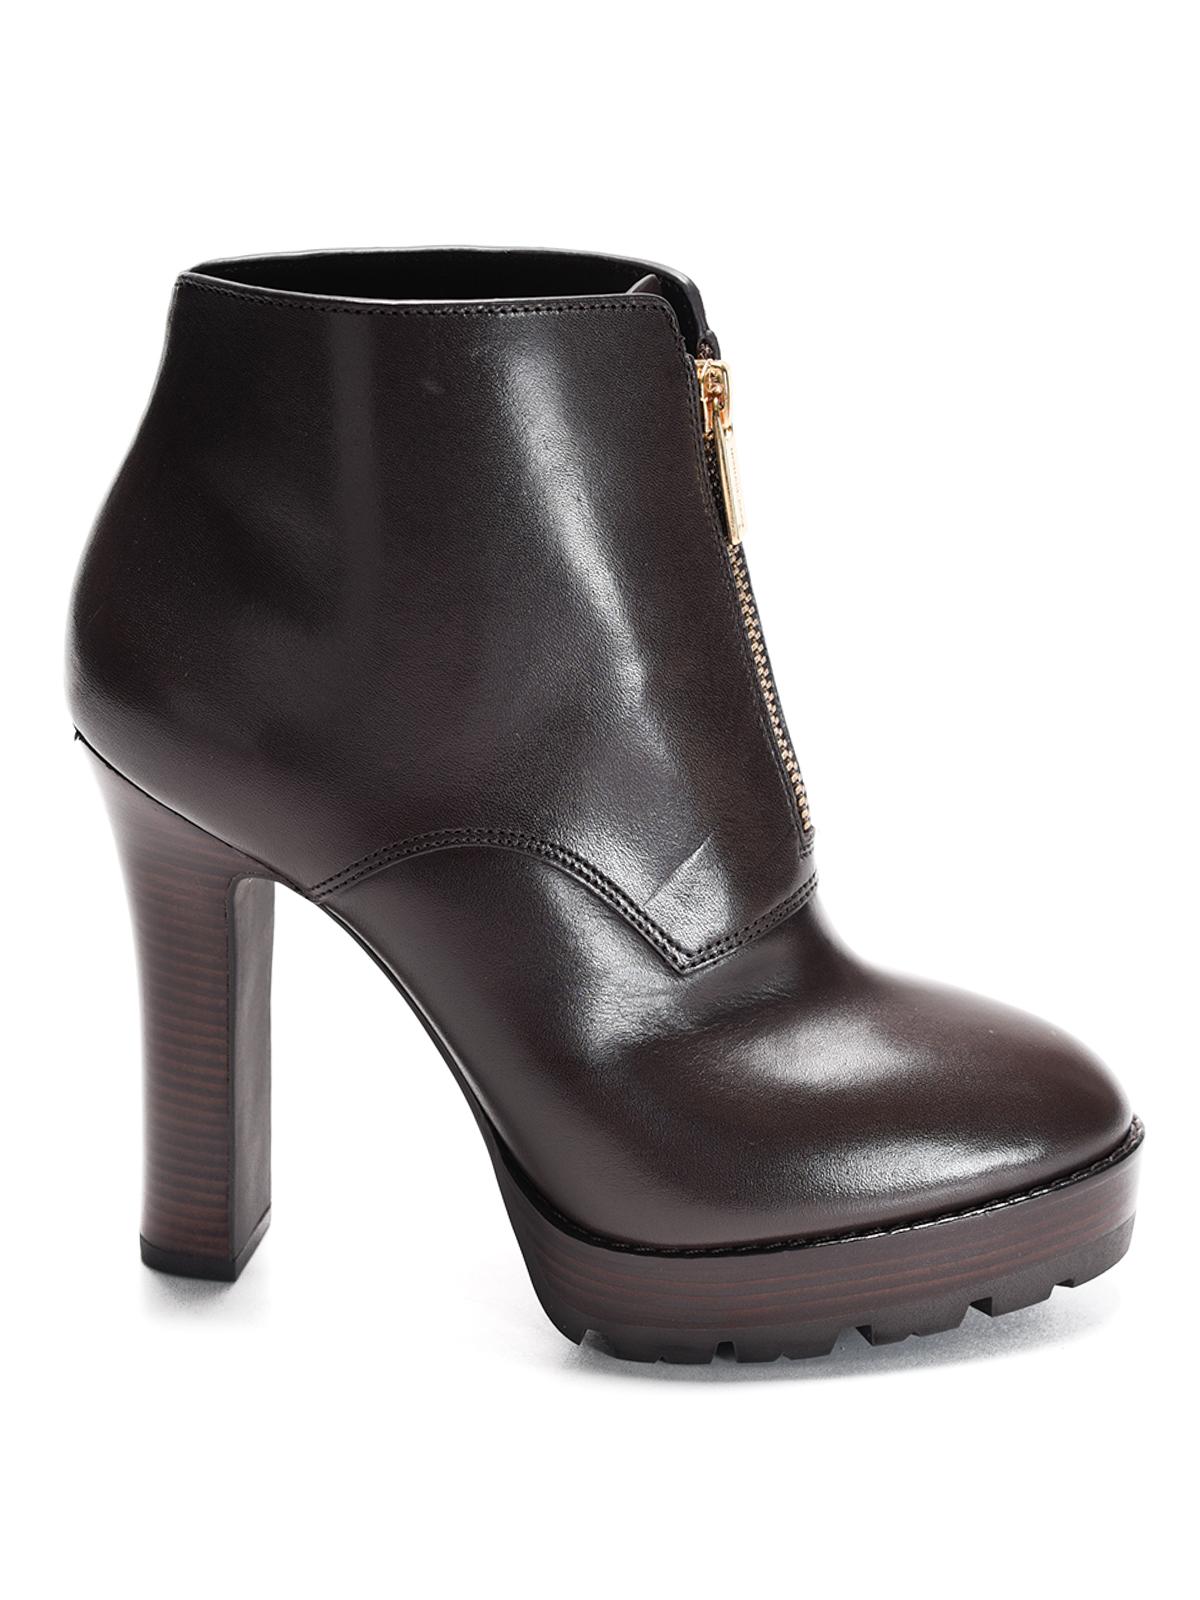 michael kors flynn leather ankle boots ankle boots. Black Bedroom Furniture Sets. Home Design Ideas